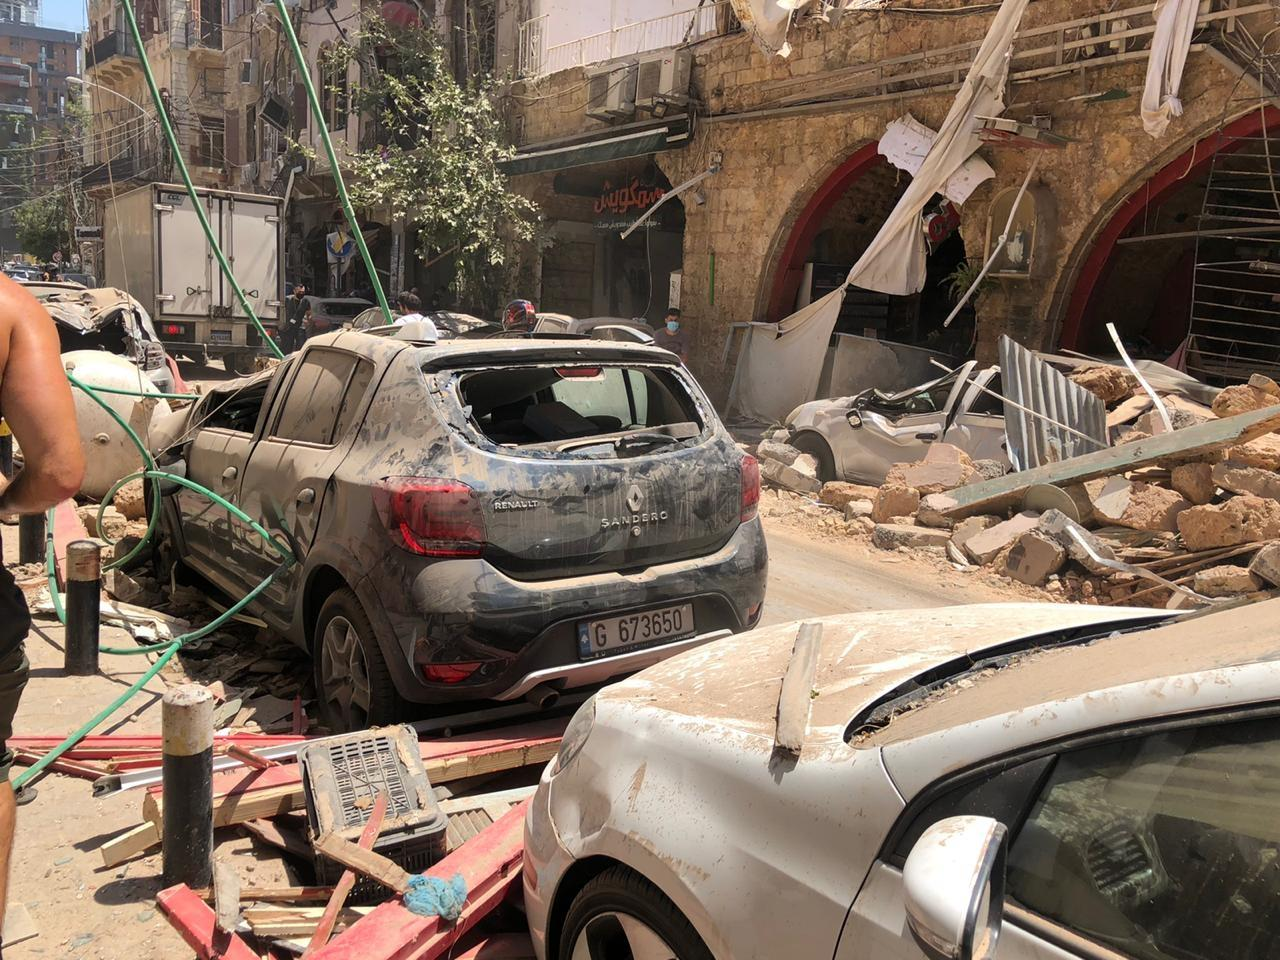 Emergency Response to Explosion in Lebanon